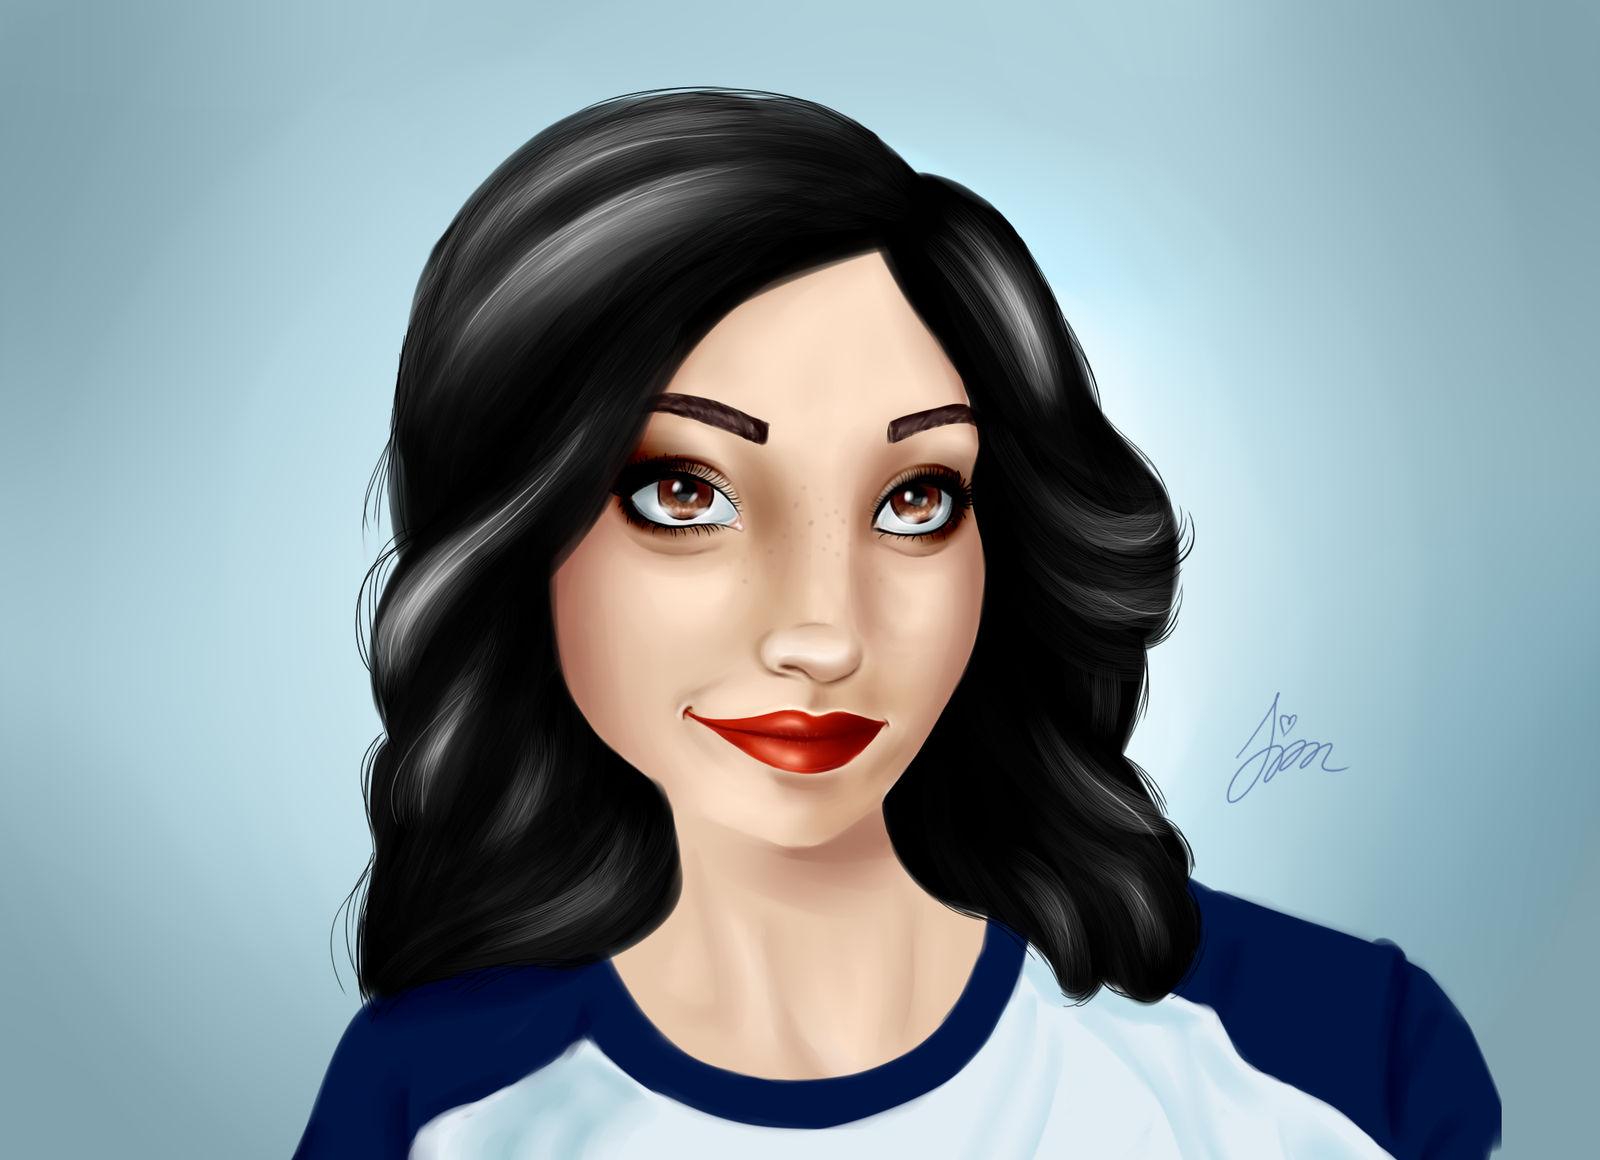 Laia Lopez digital painting by iamszissz